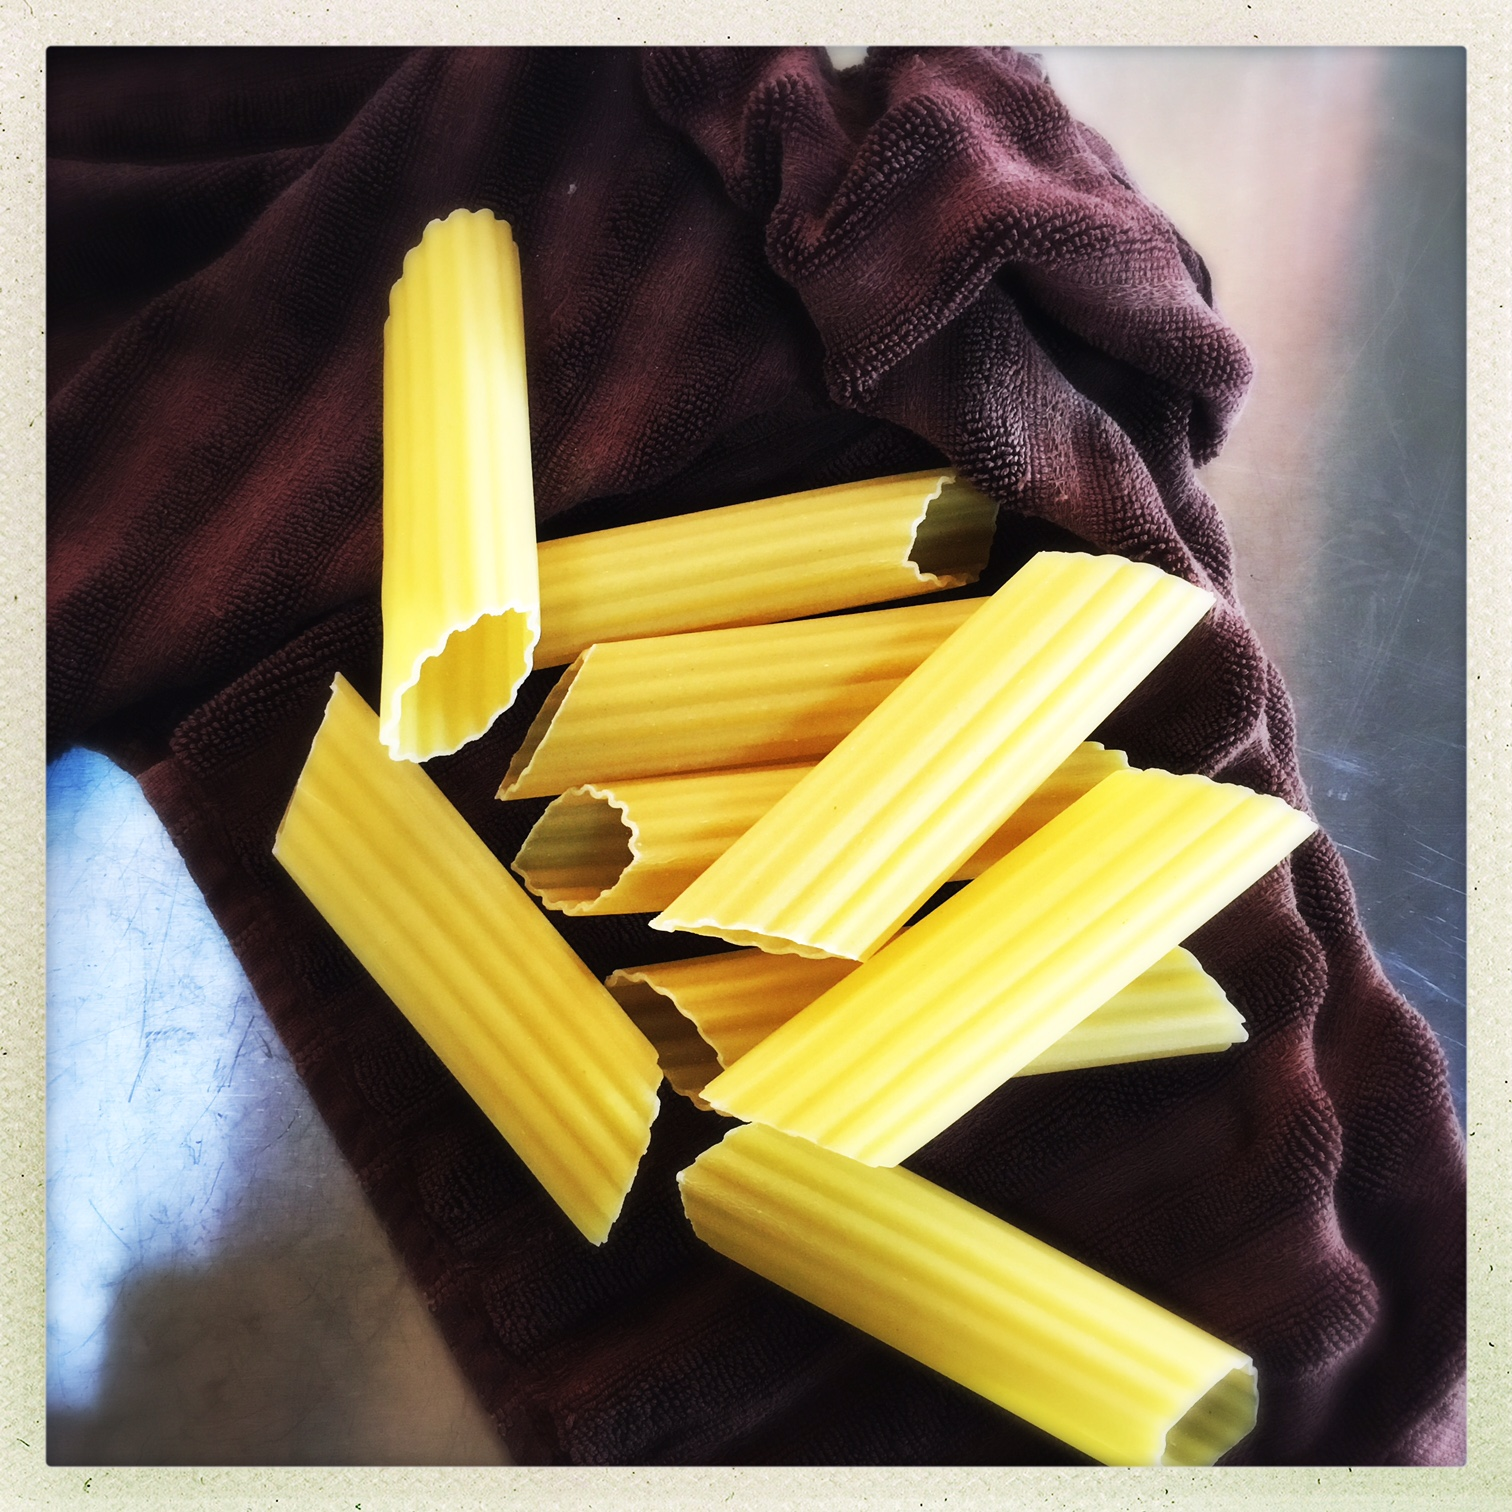 manicotti noodle.jpg